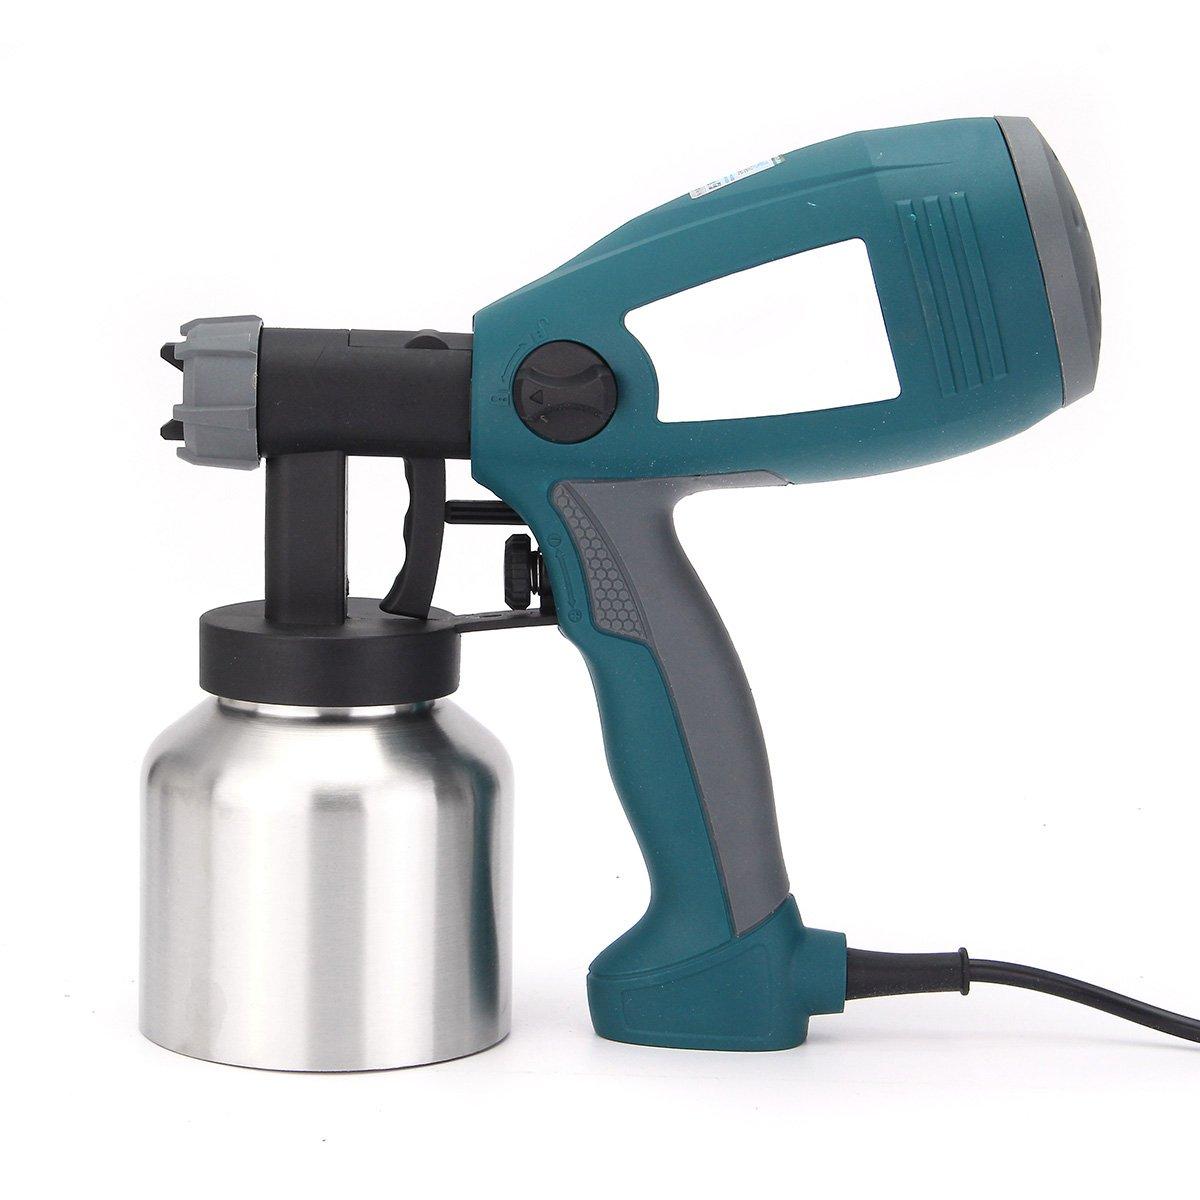 220V 500W Paint Sprayer Gun Control Pattern Spray Professional Control Electric Spray Gun